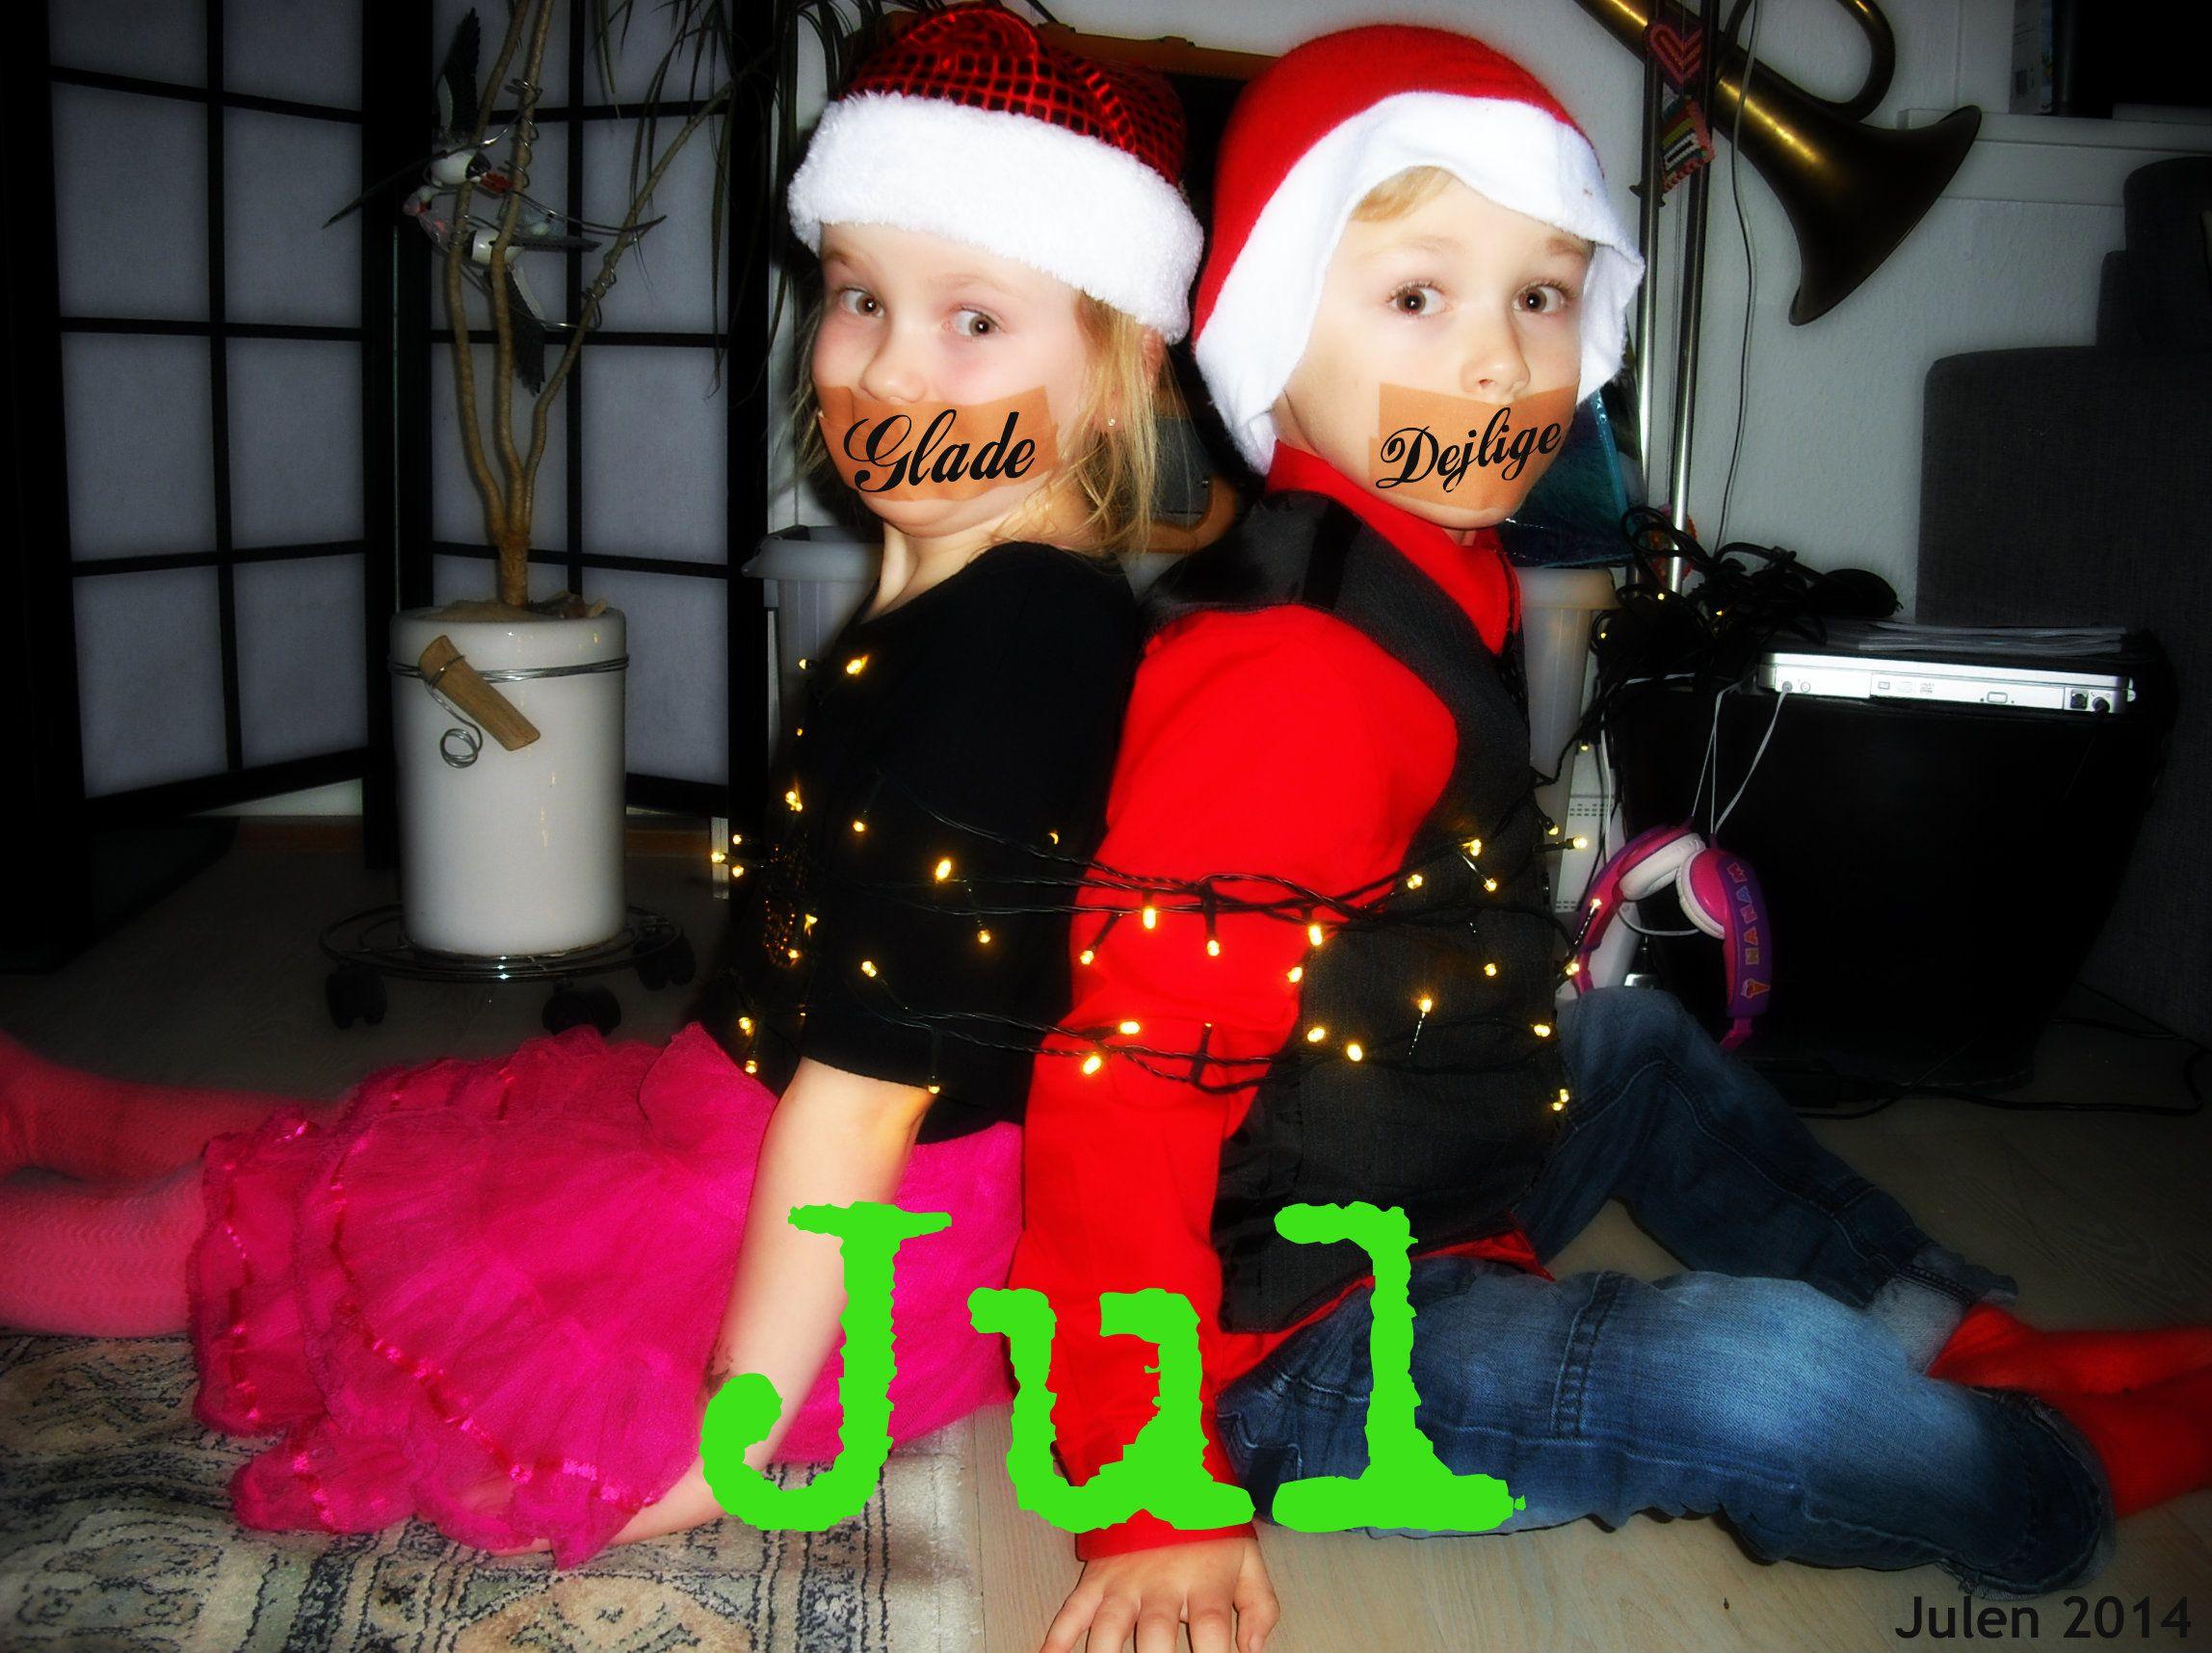 Fotosjov Med Tvillingerne Til Jul Photofun With The Twins For Christmas Funny Christmas Pictures Funny Christmas Cards Family Christmas Pictures